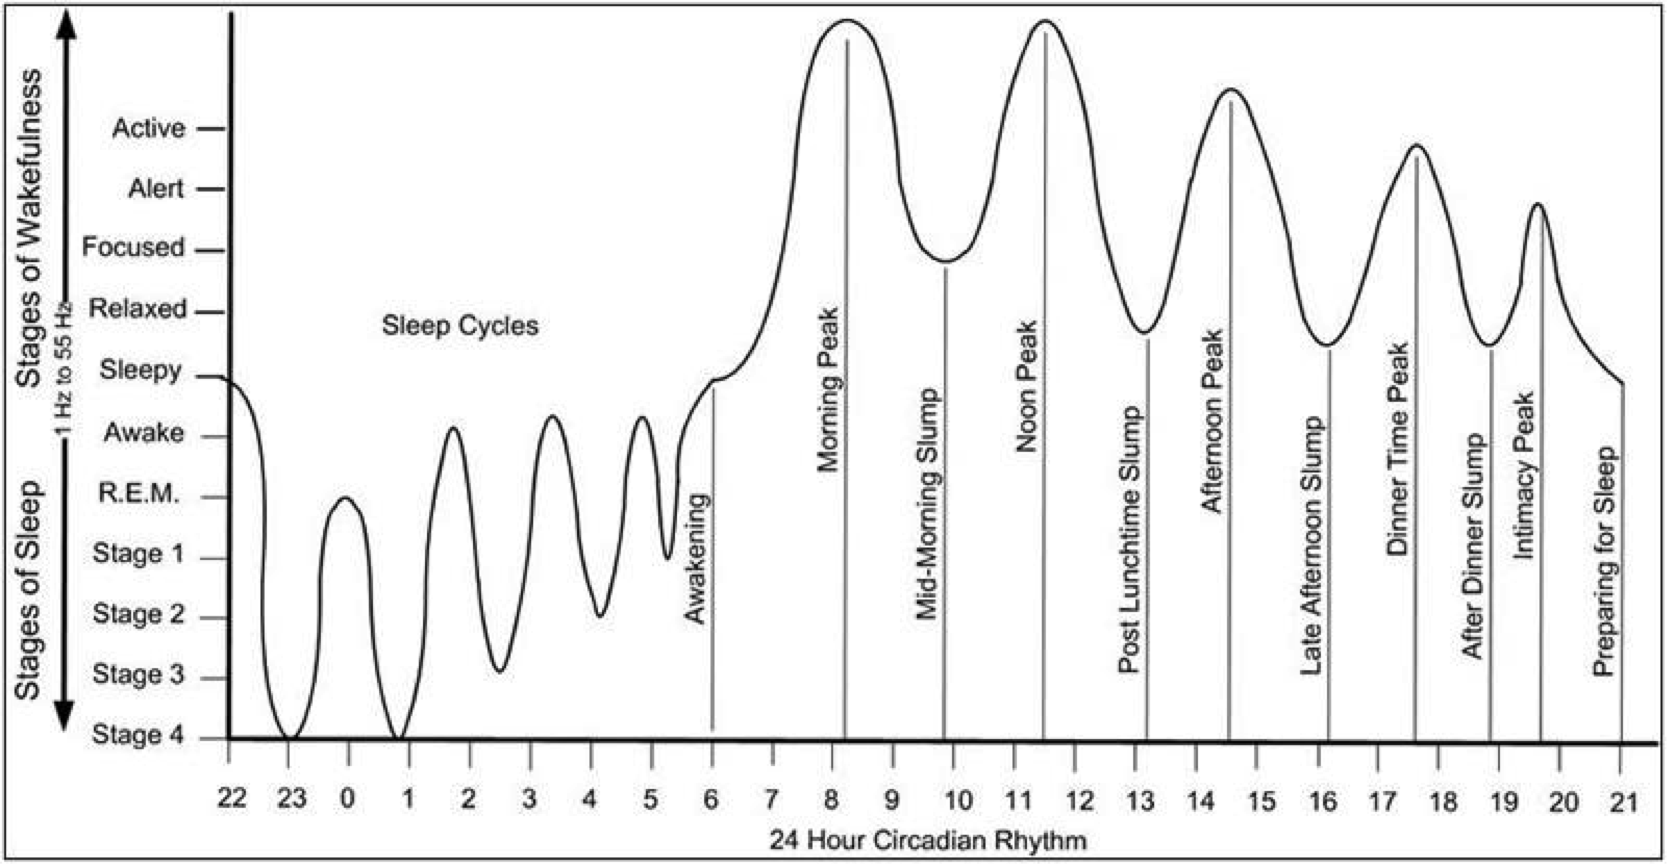 Sleep_Cycles_Chart.png